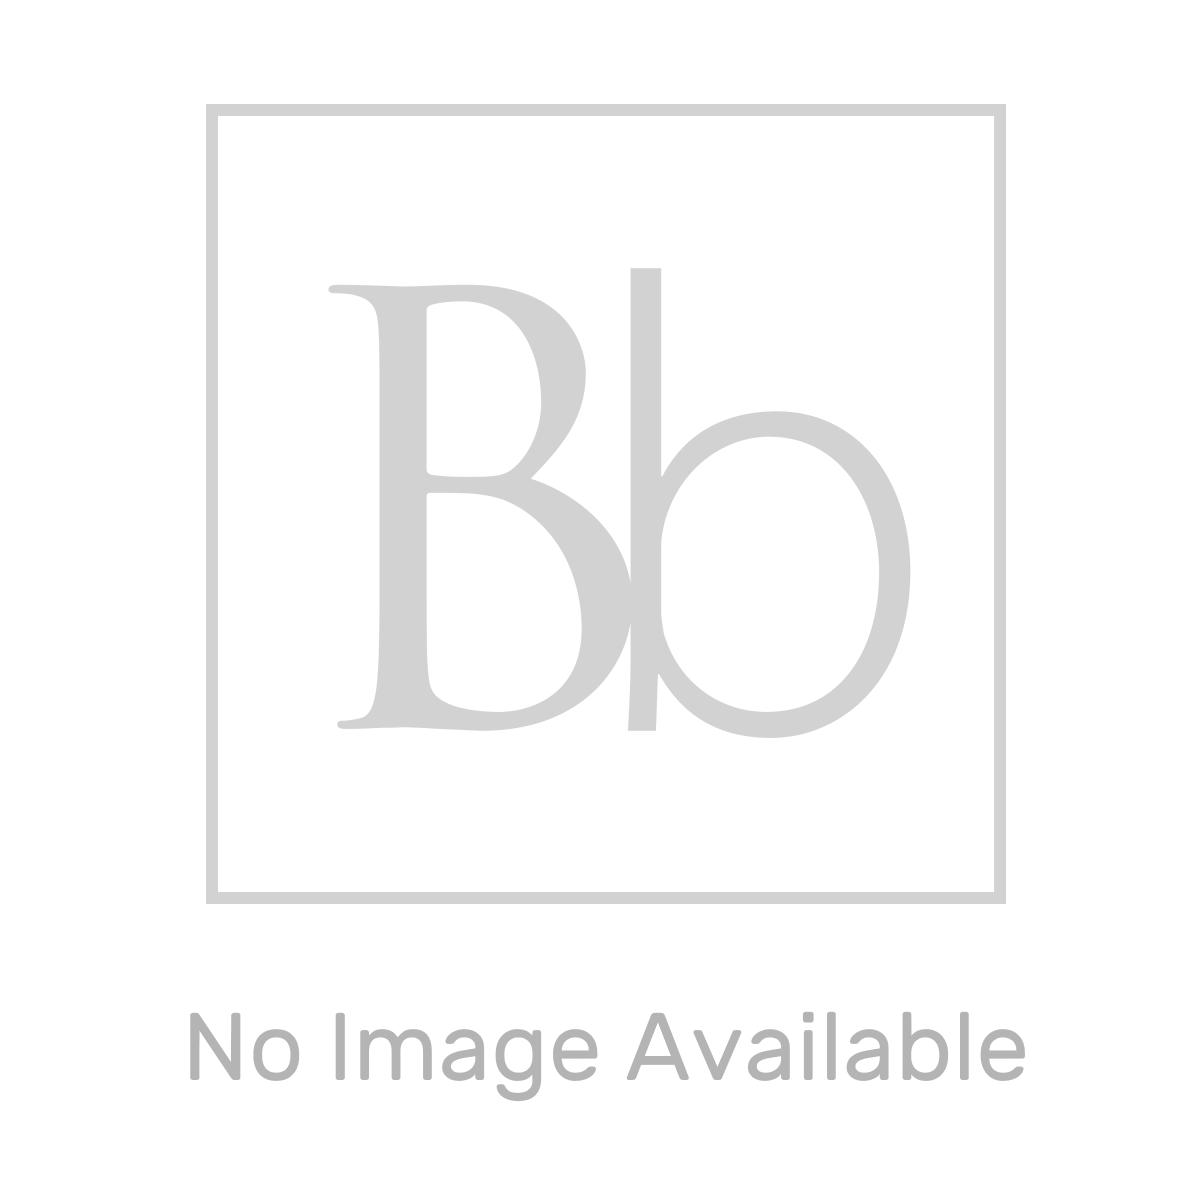 RAK Surface Mid Grey Tile 600 x 600mm Lifestyle